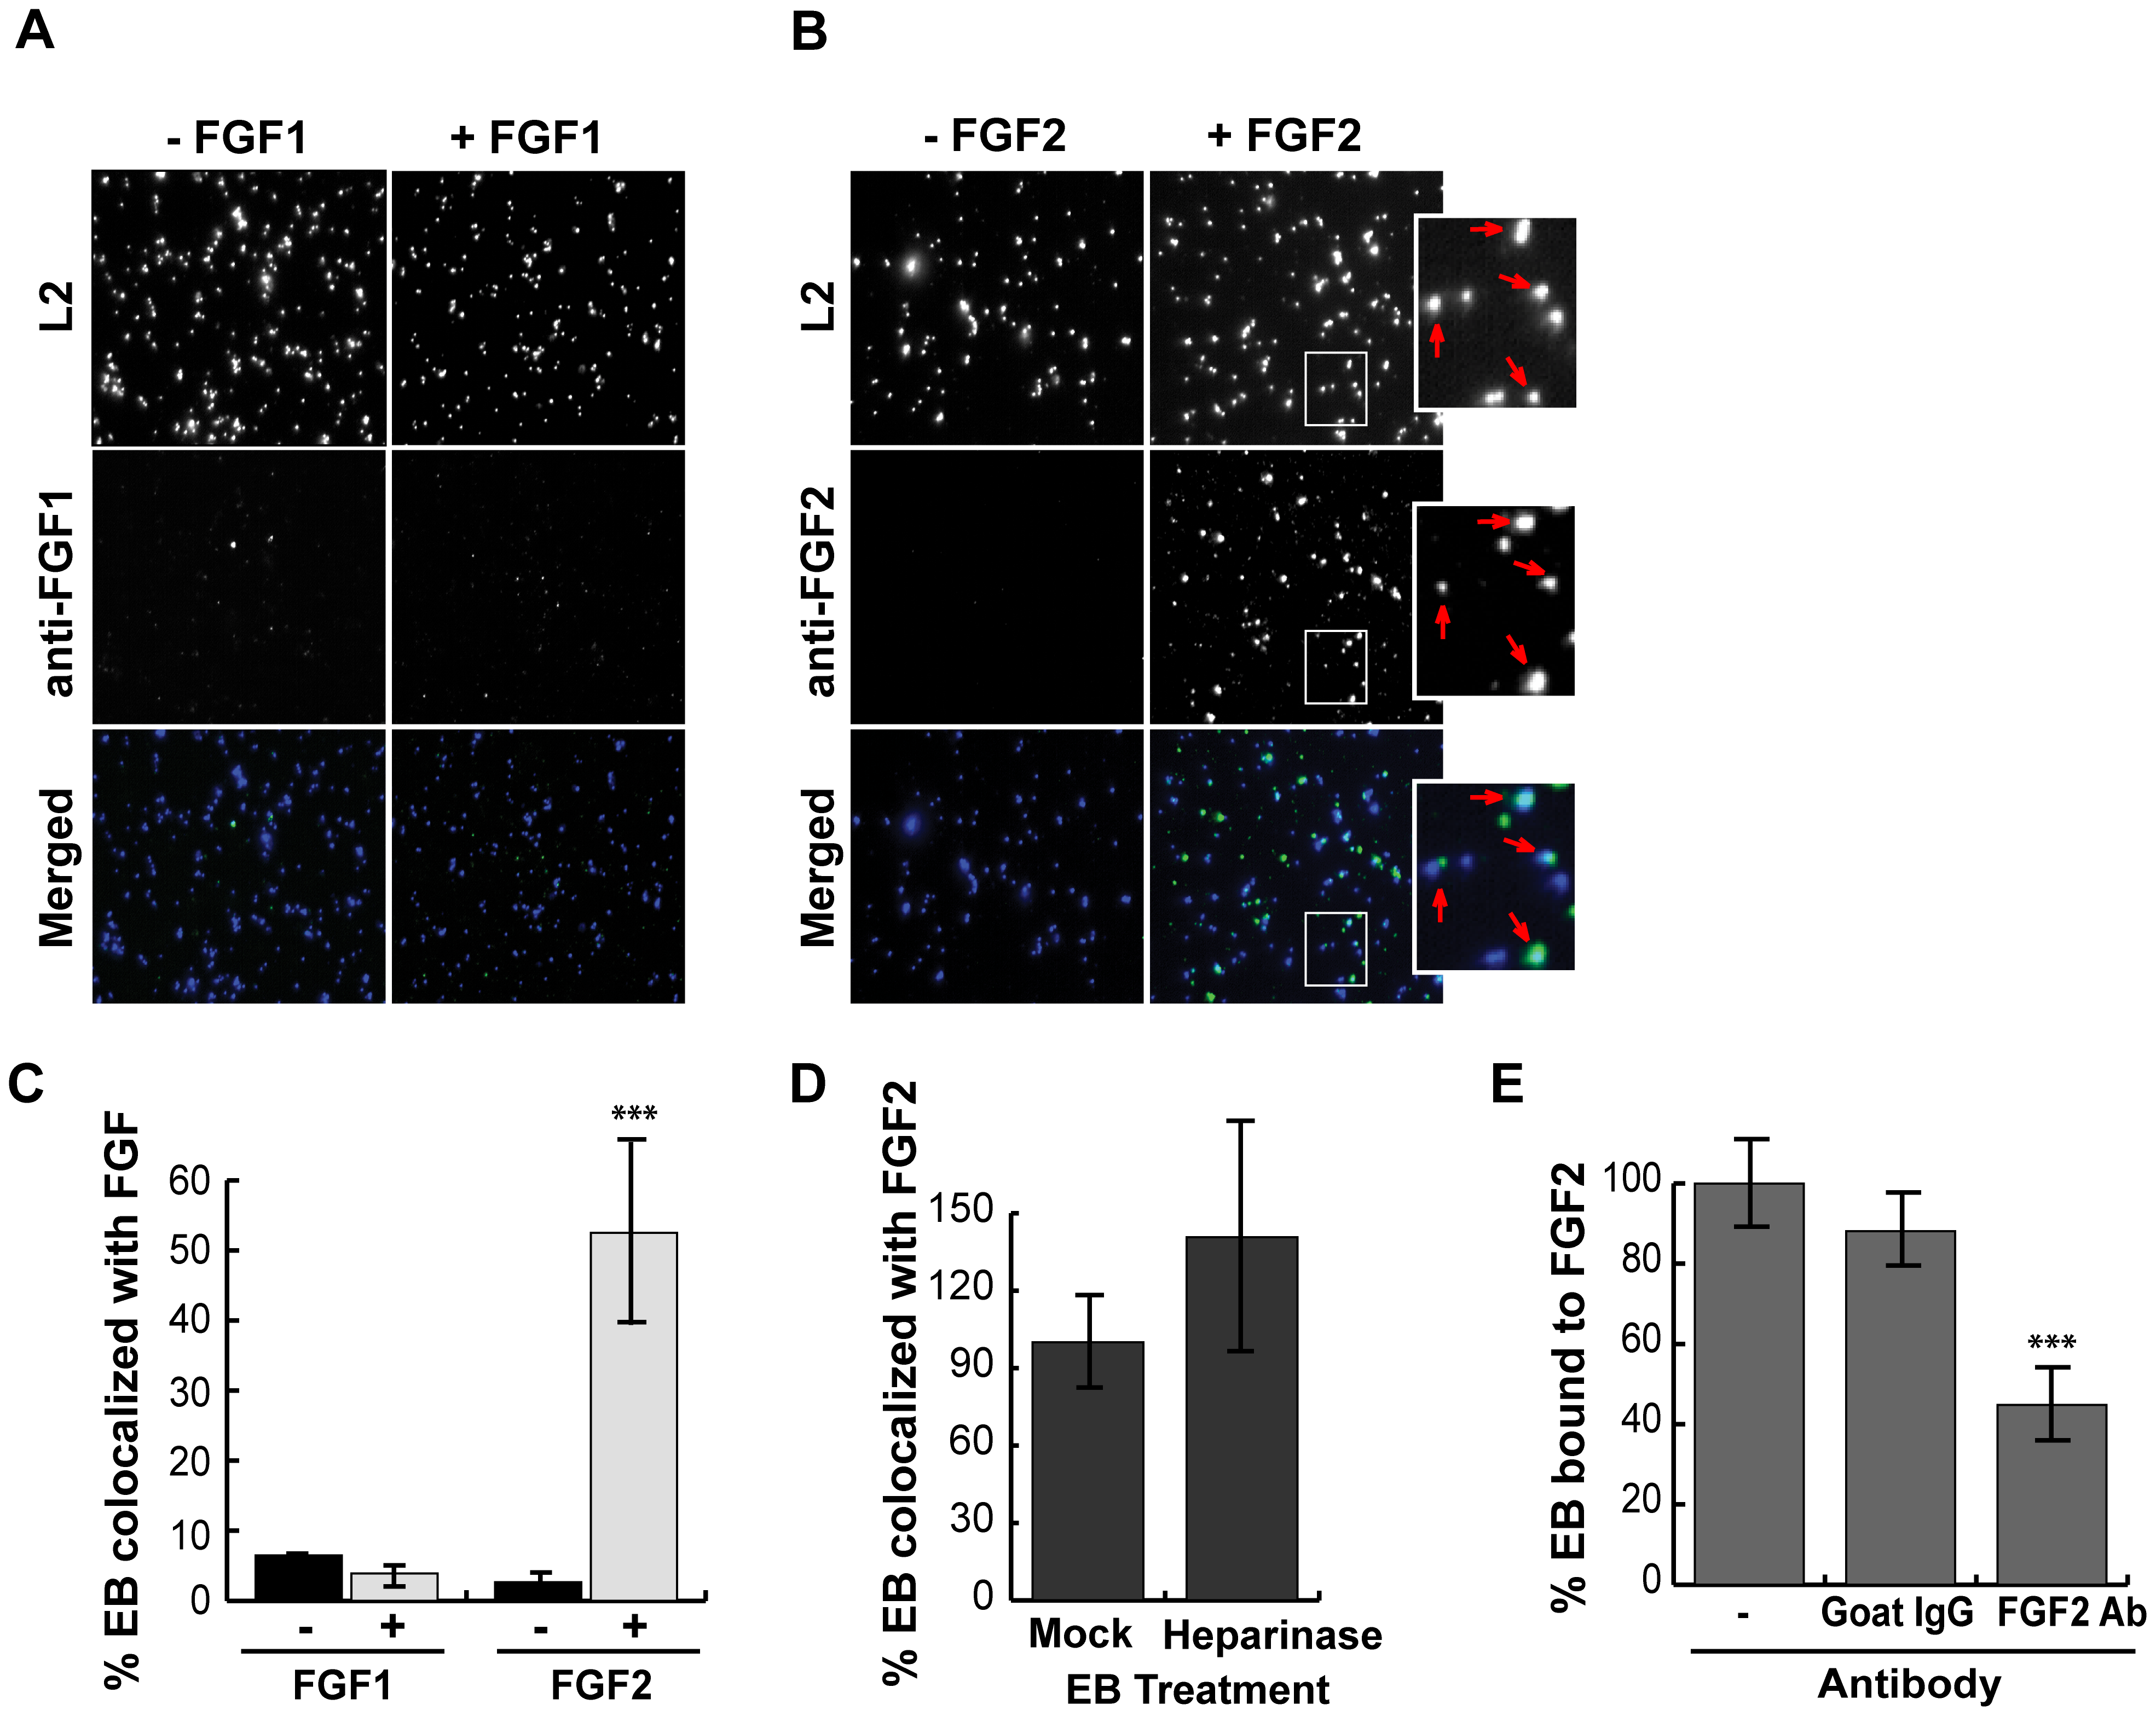 FGF2 binds to renograffin-purified <i>C. trachomatis</i> L2 EBs.